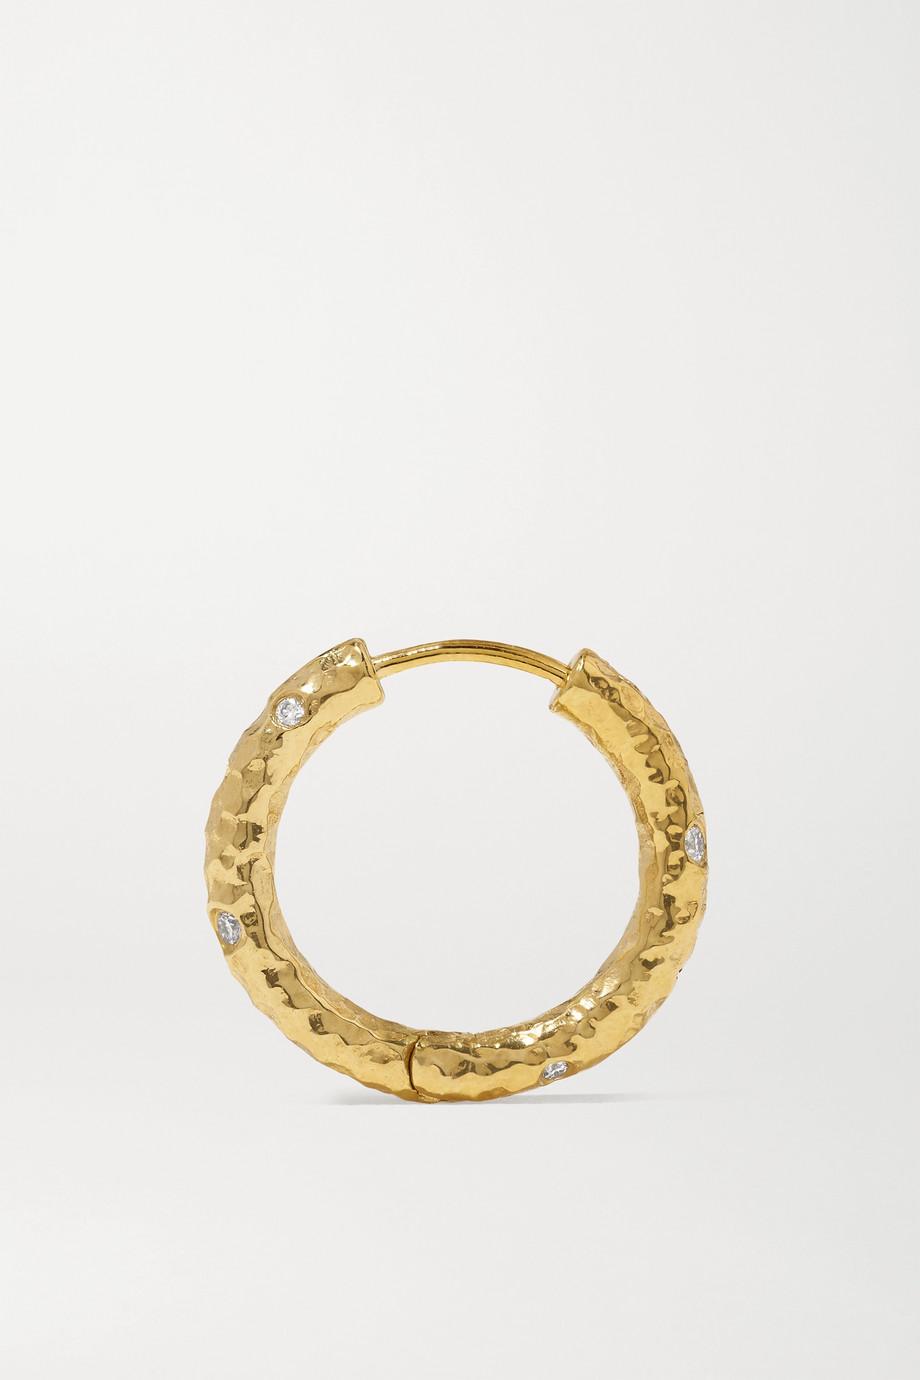 Octavia Elizabeth Nesting Gem Gabby 18-karat gold diamond hoop earrings